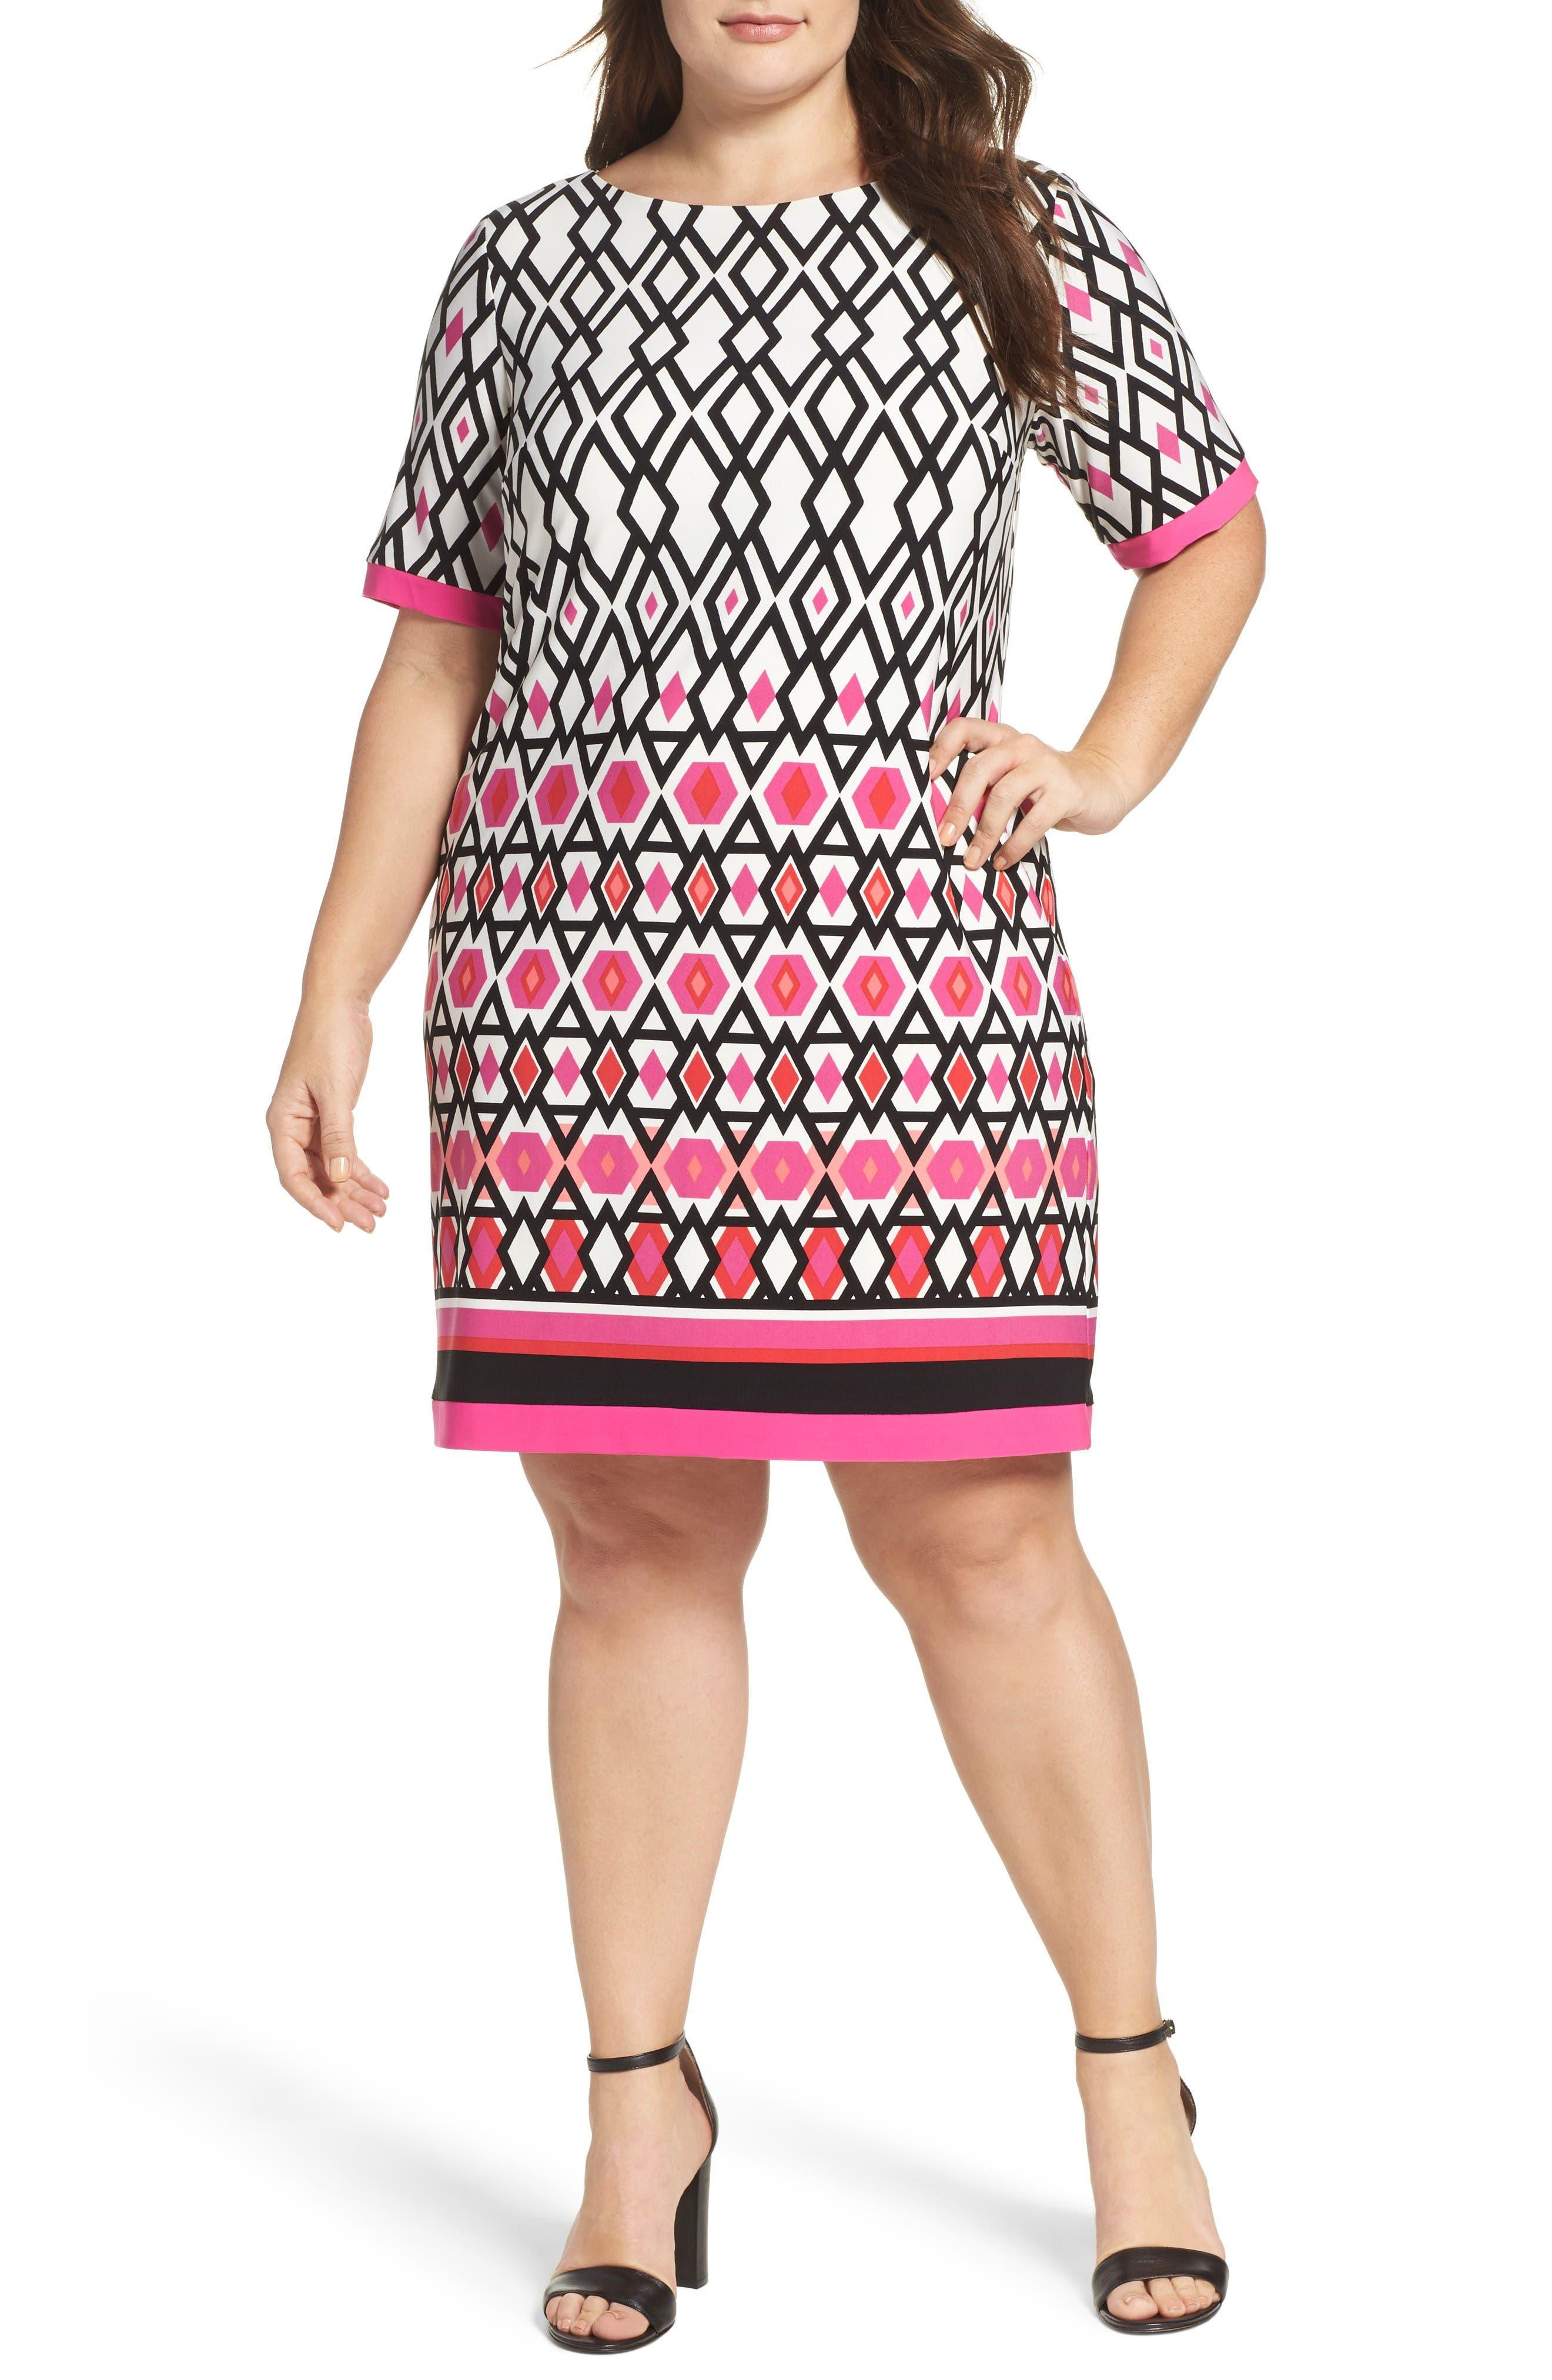 Alternate Image 1 Selected - Eliza J Graphic Print Shift Dress (Plus Size)